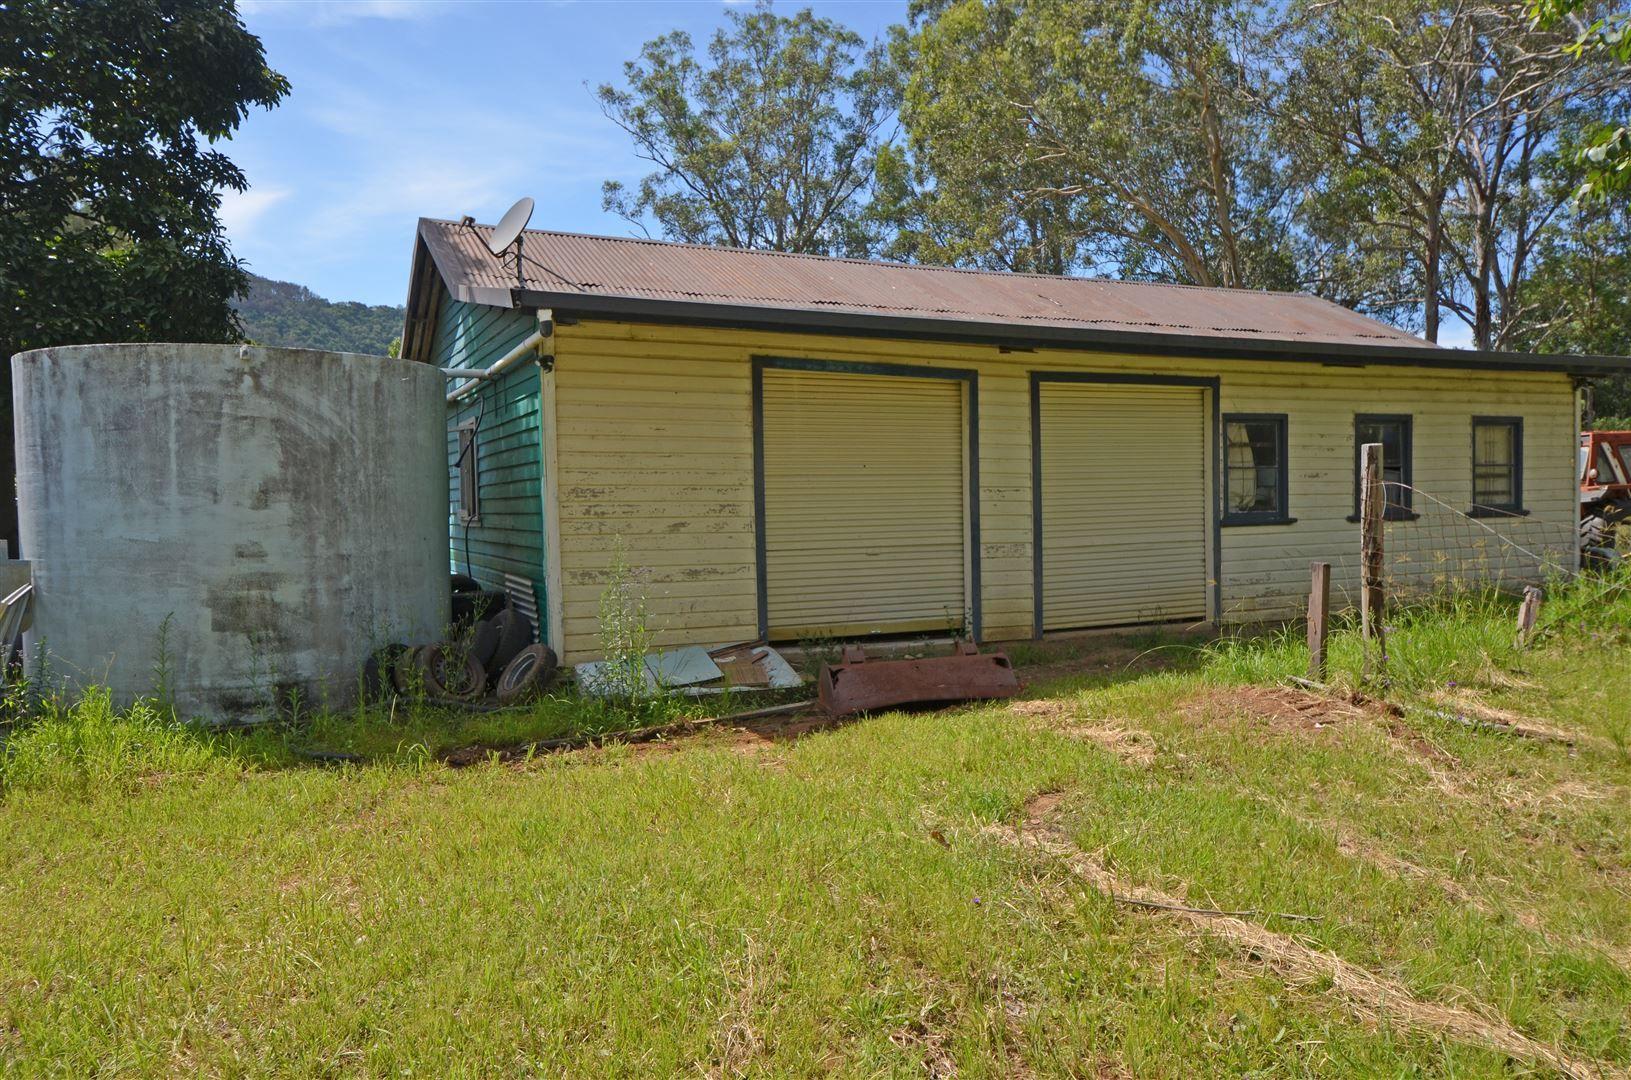 Lot1/DP758383 - 36 Main Street, Ellenborough NSW 2446, Image 0